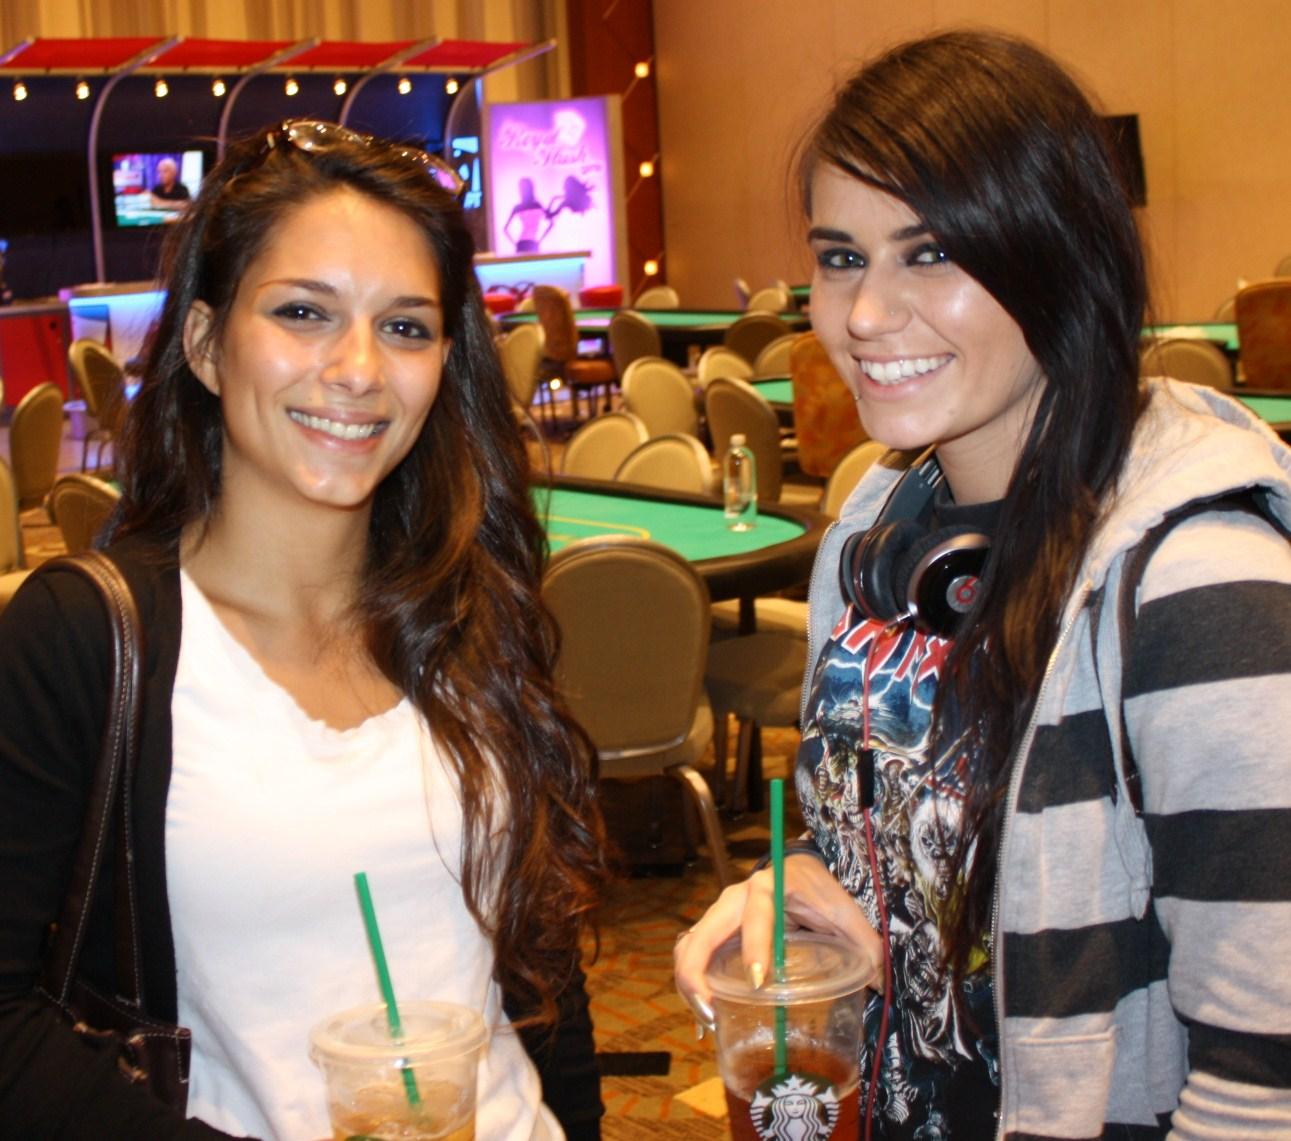 Jenna cortese poker